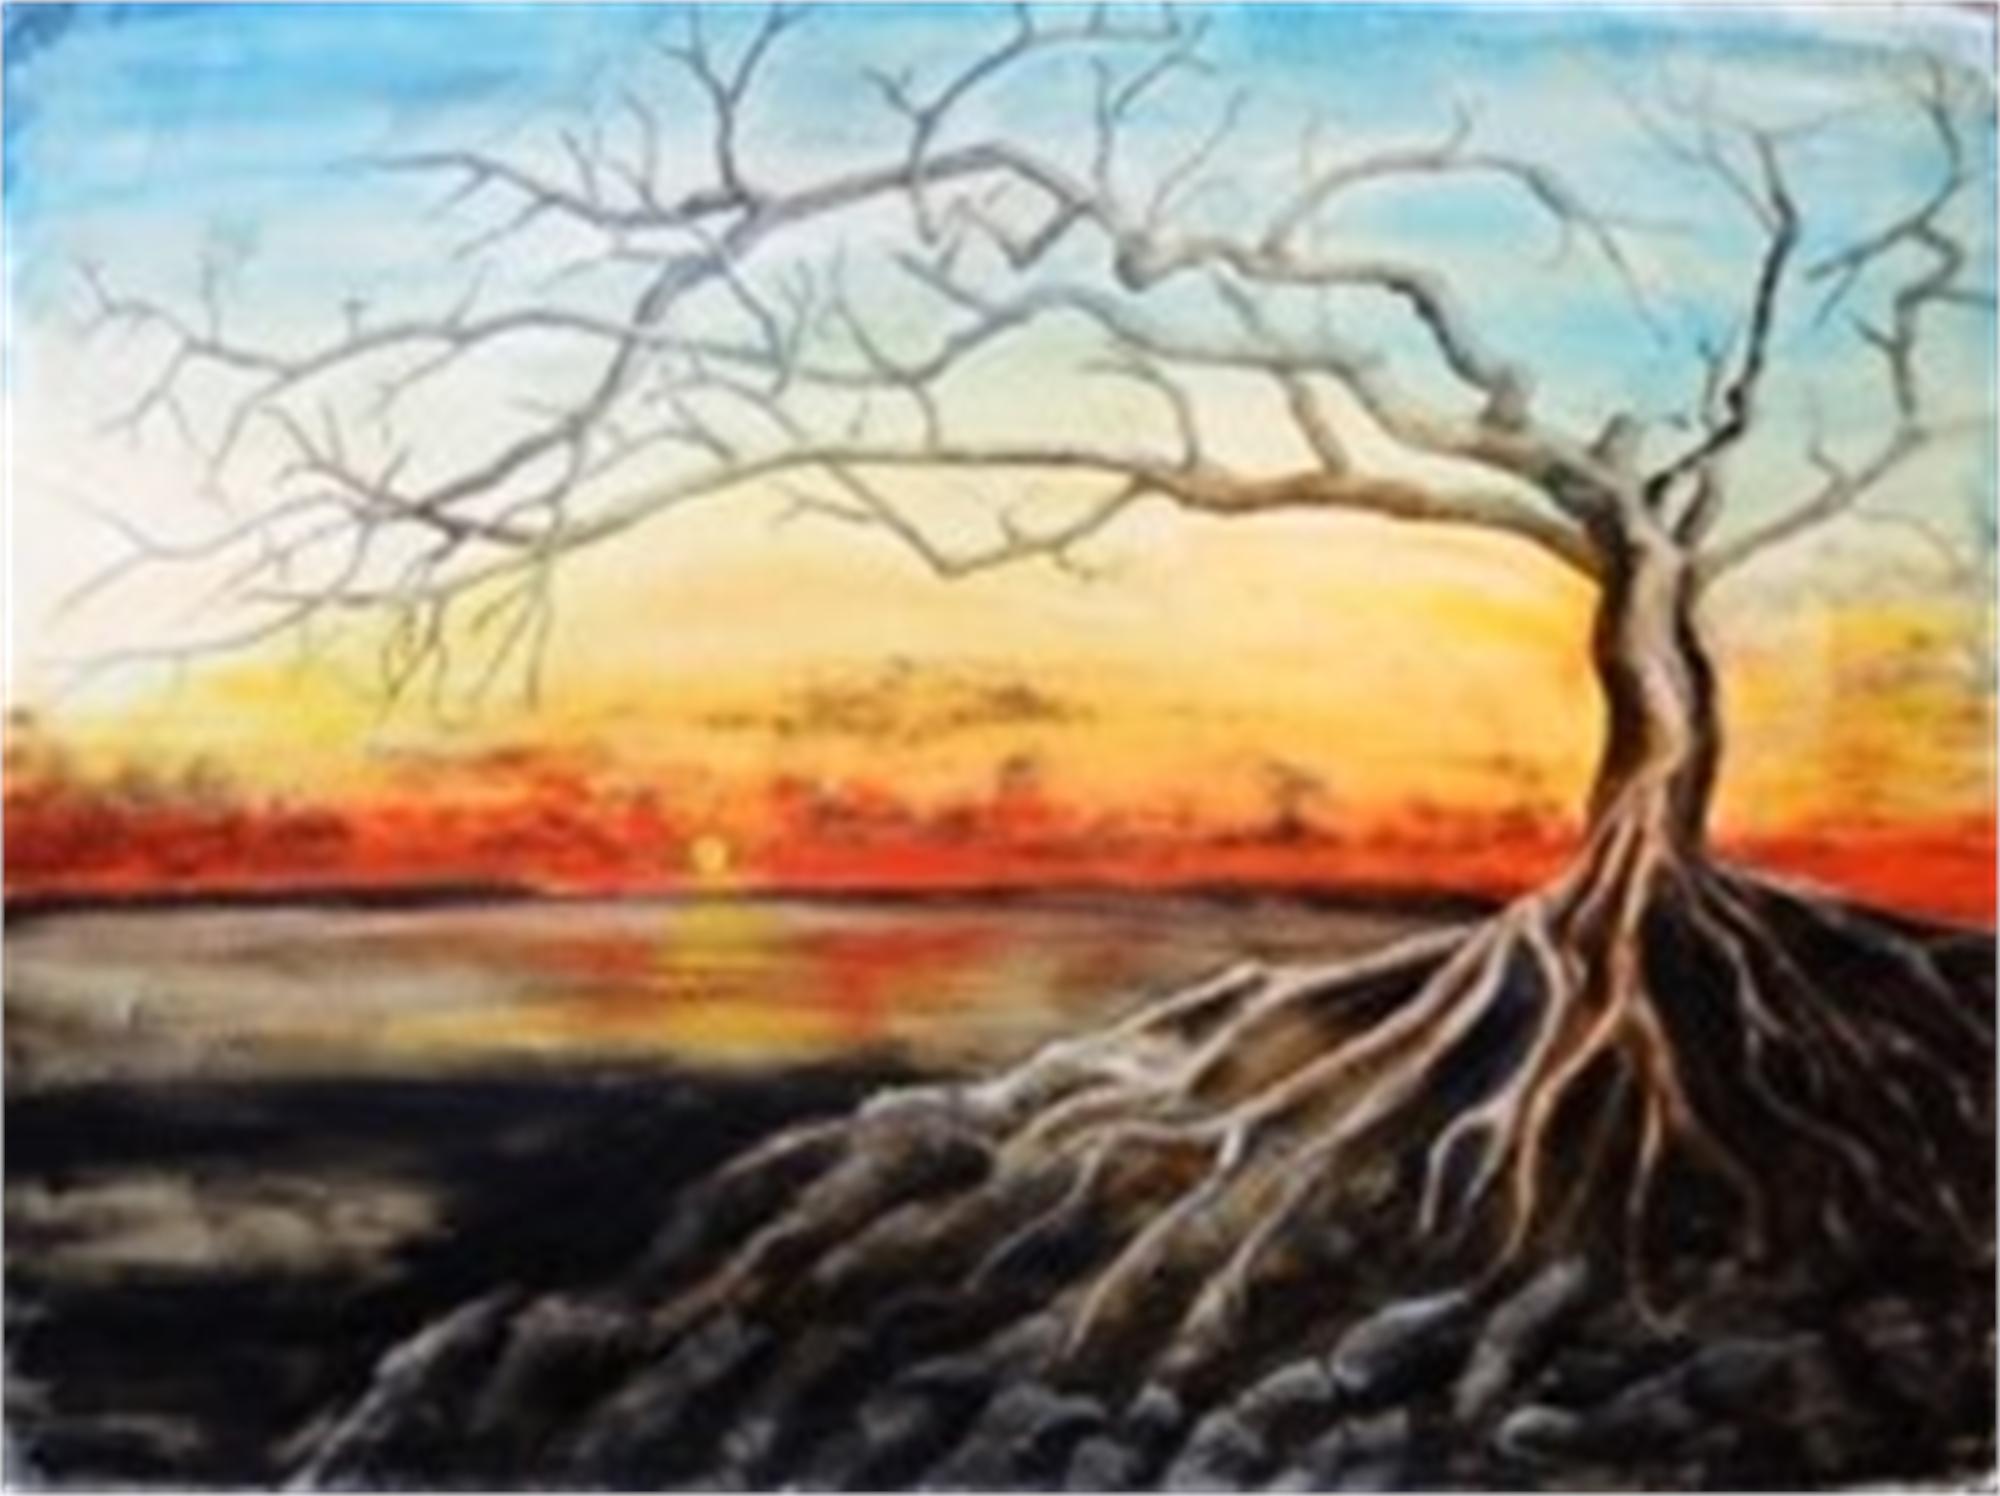 A Tree by the Sea by Nina Vallion (Portland, OR)